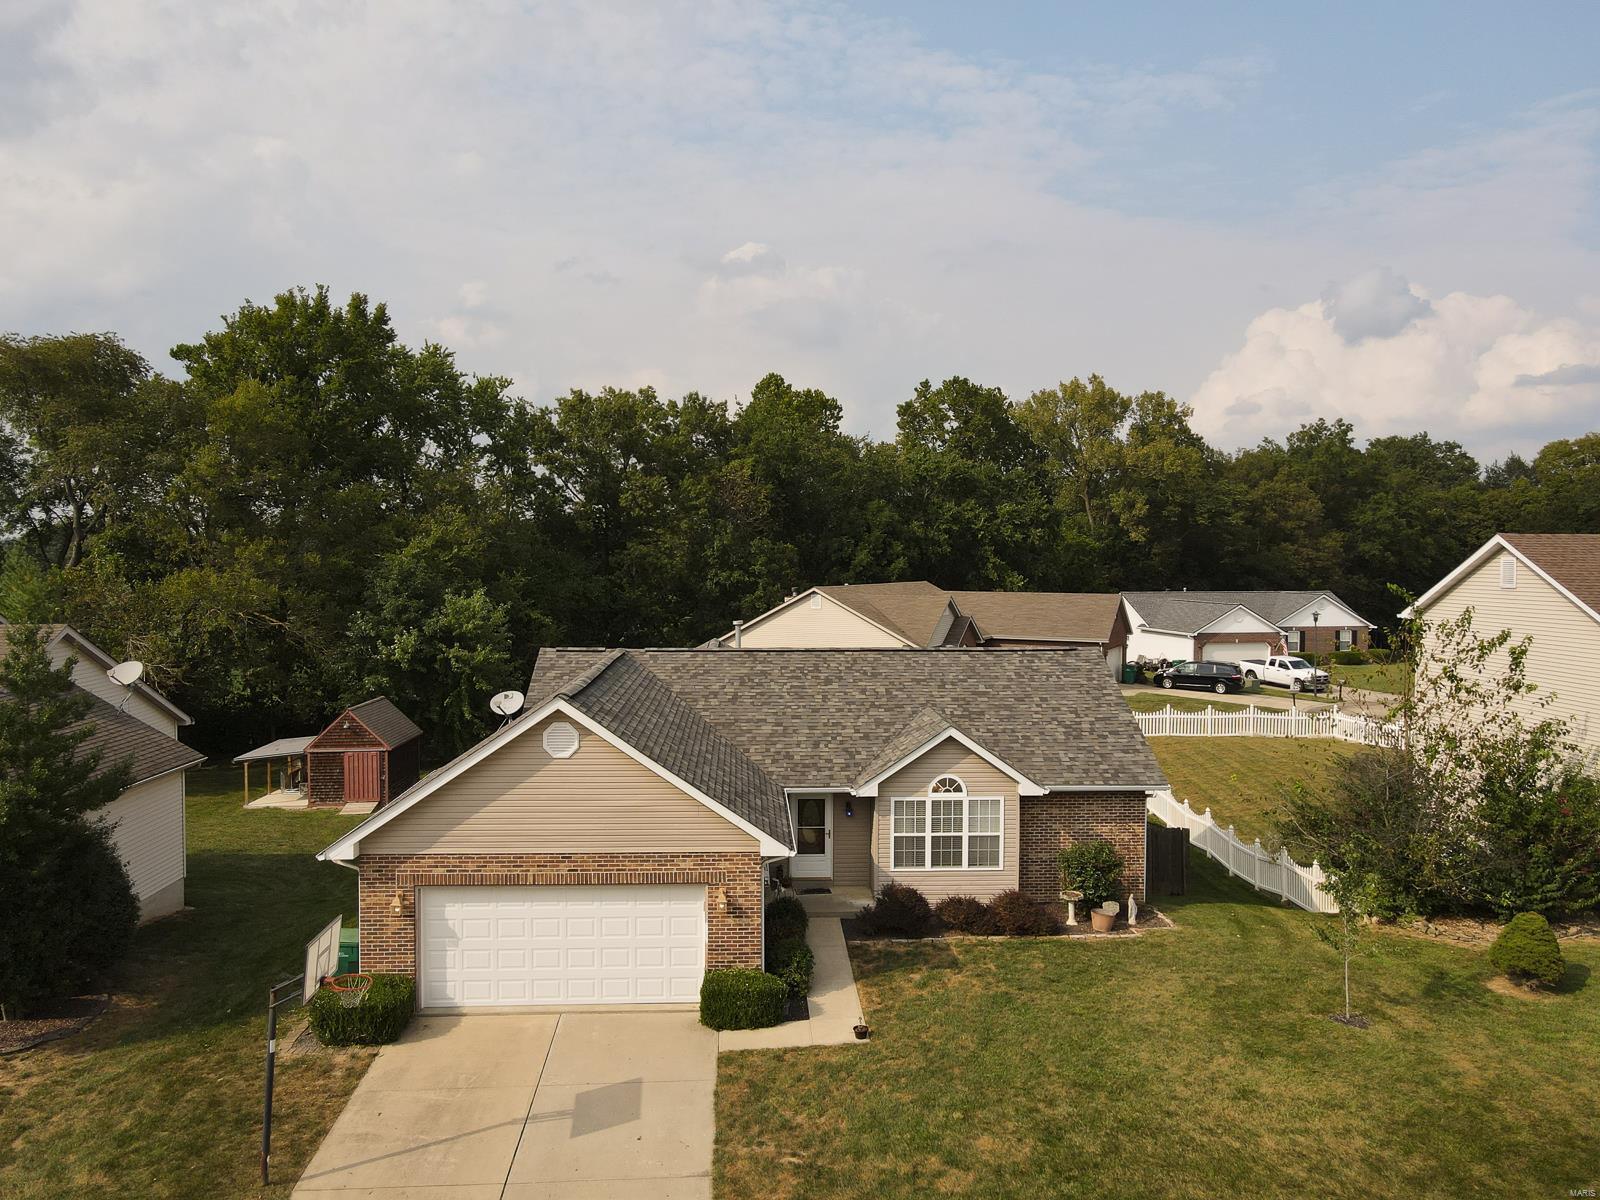 206 Sun Valley Drive Property Photo - Smithton, IL real estate listing